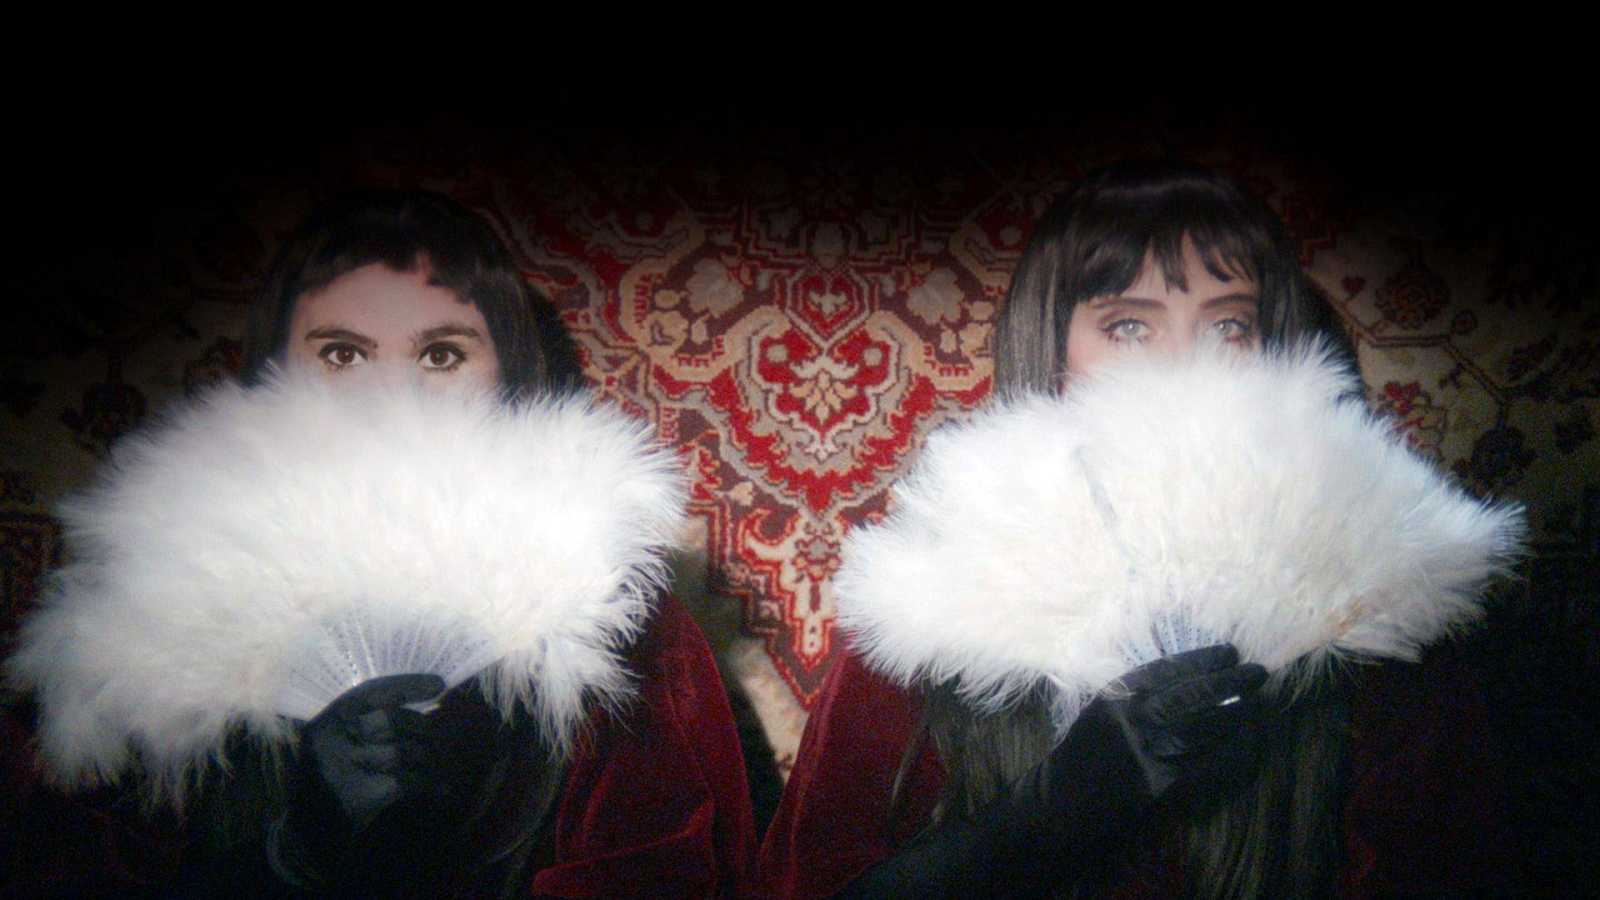 180 Grados - Miranda! & Javiera Mena, Fickle Friends, James Blake y Freddie Mercury - 24/11/20 - escuchar ahora